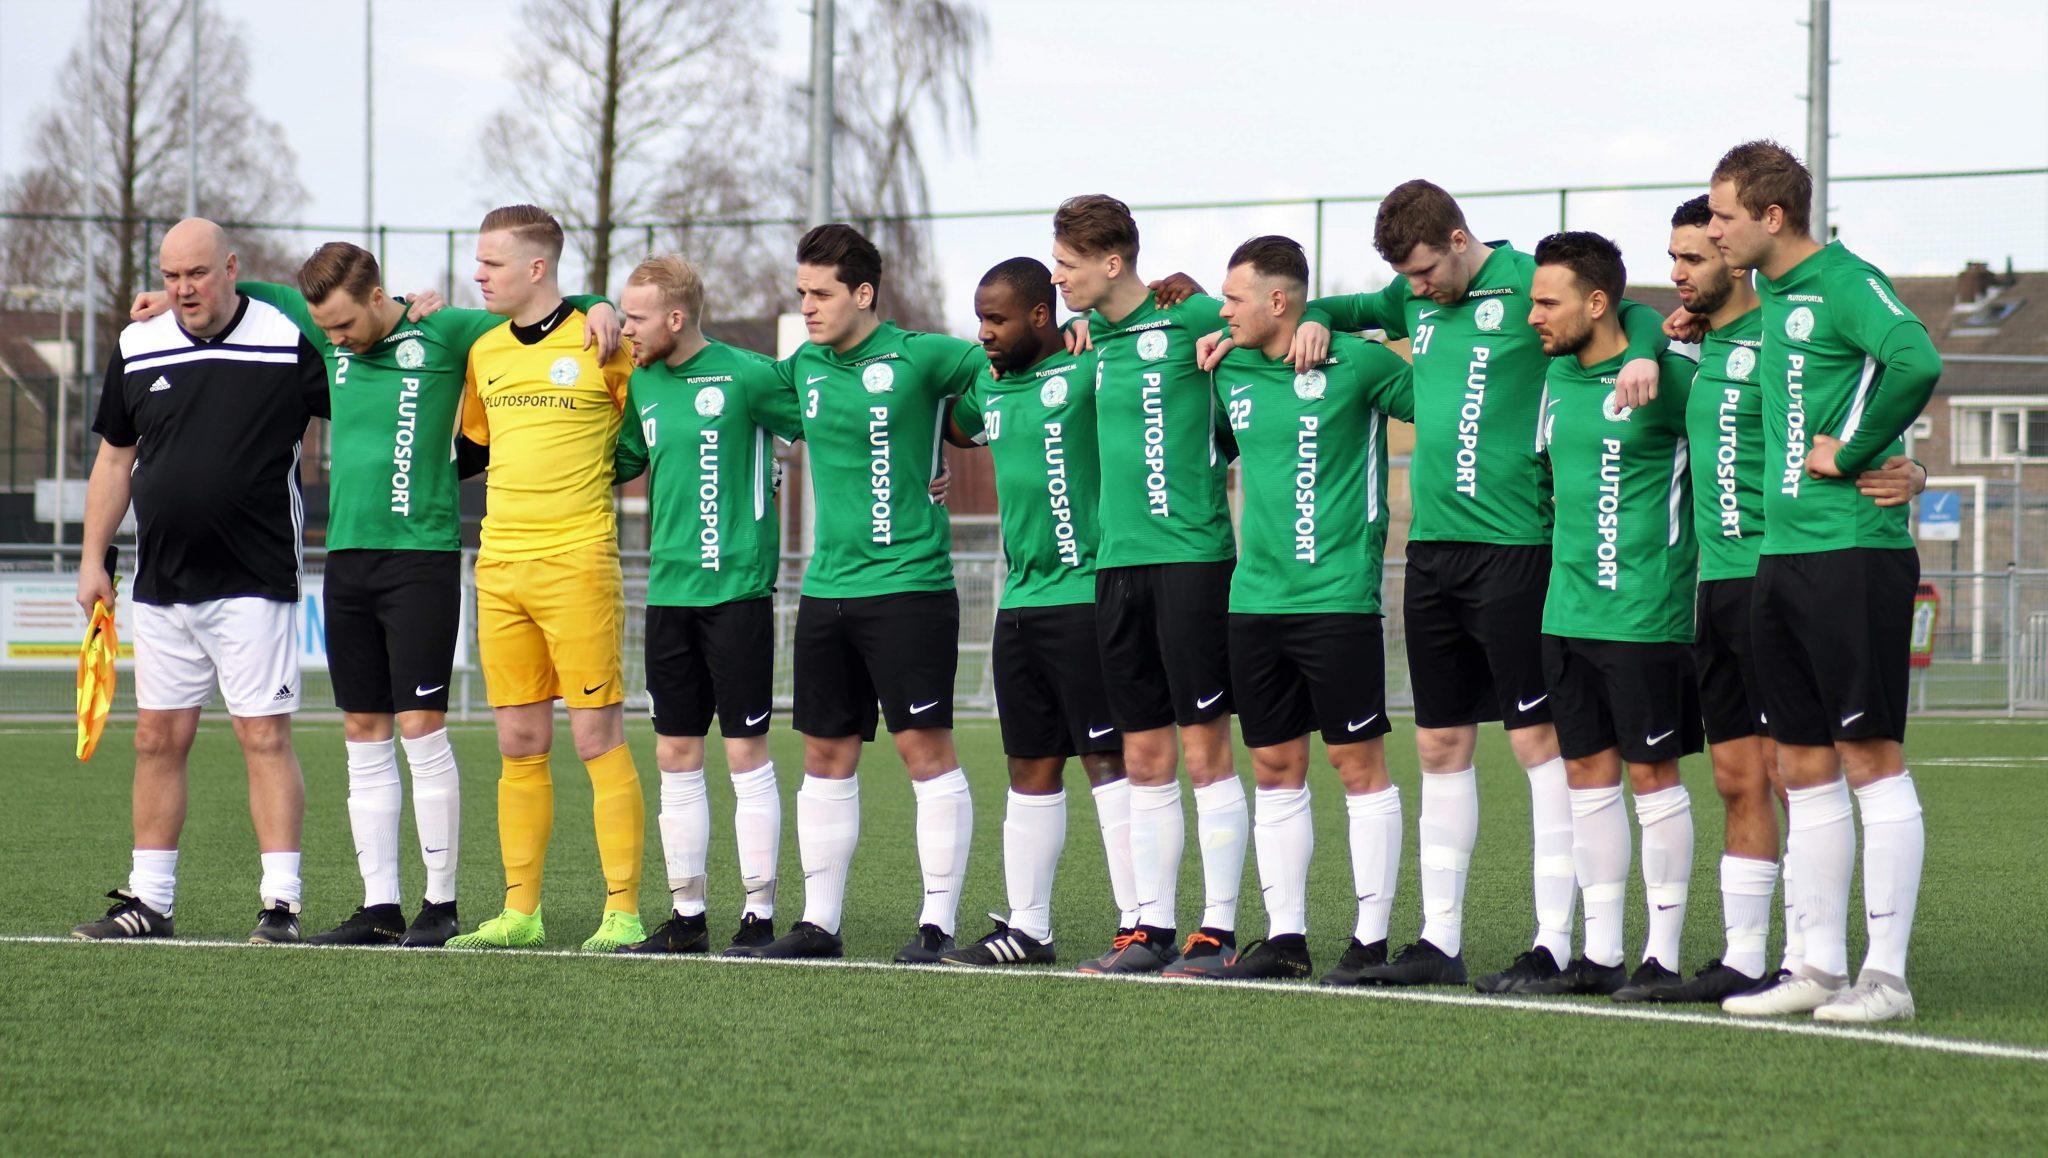 Terechte puntendeling TAVV – SV Aarlanderveen: 0-0